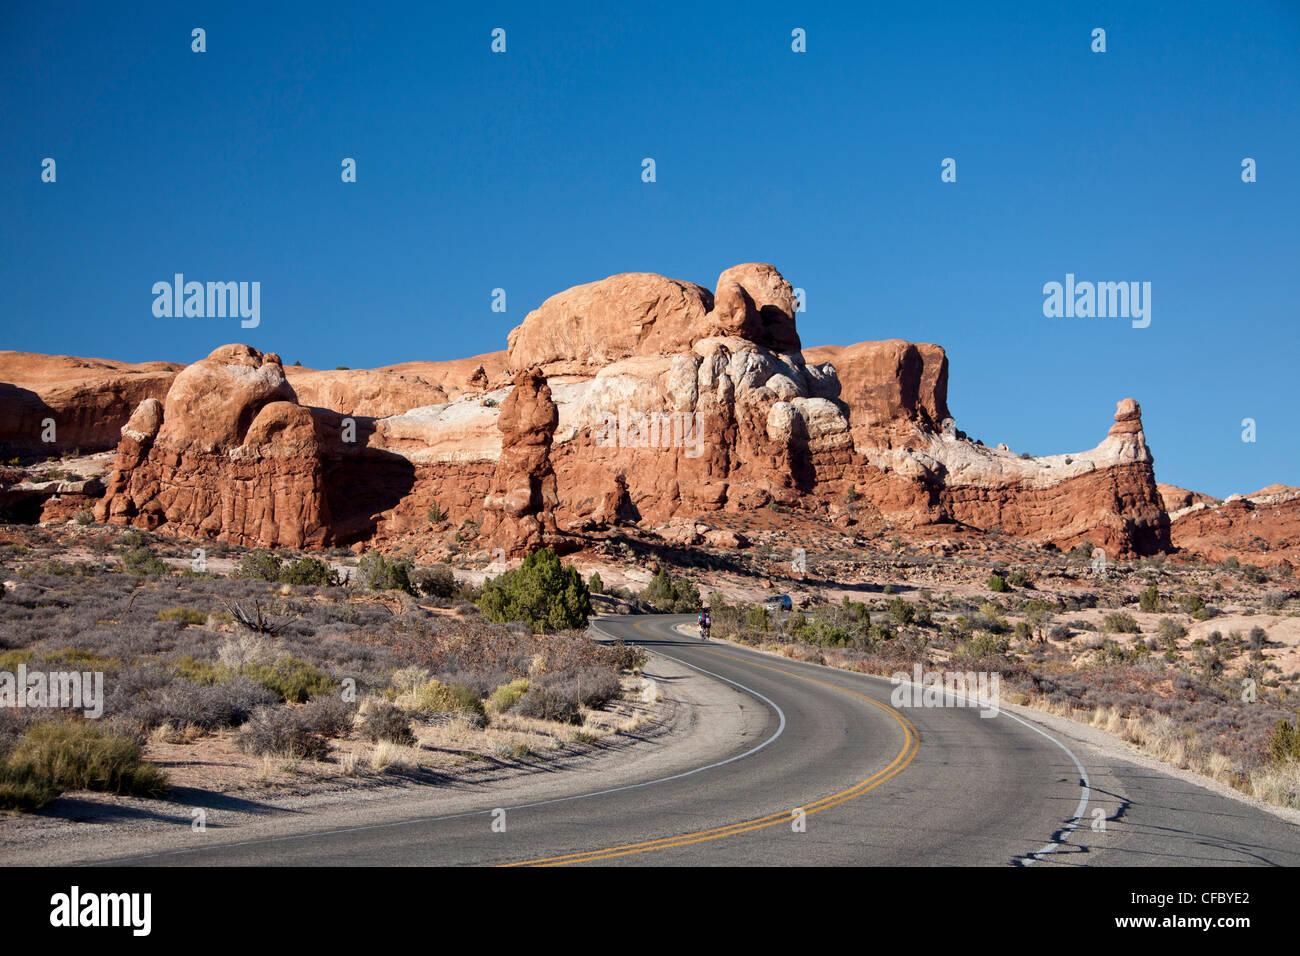 USA, USA, Amerika, Utah, Bögen, Nationalpark, Felsen, Formationen, Bögen fahren, Abenteuer, trocken, Erosion, Stockbild